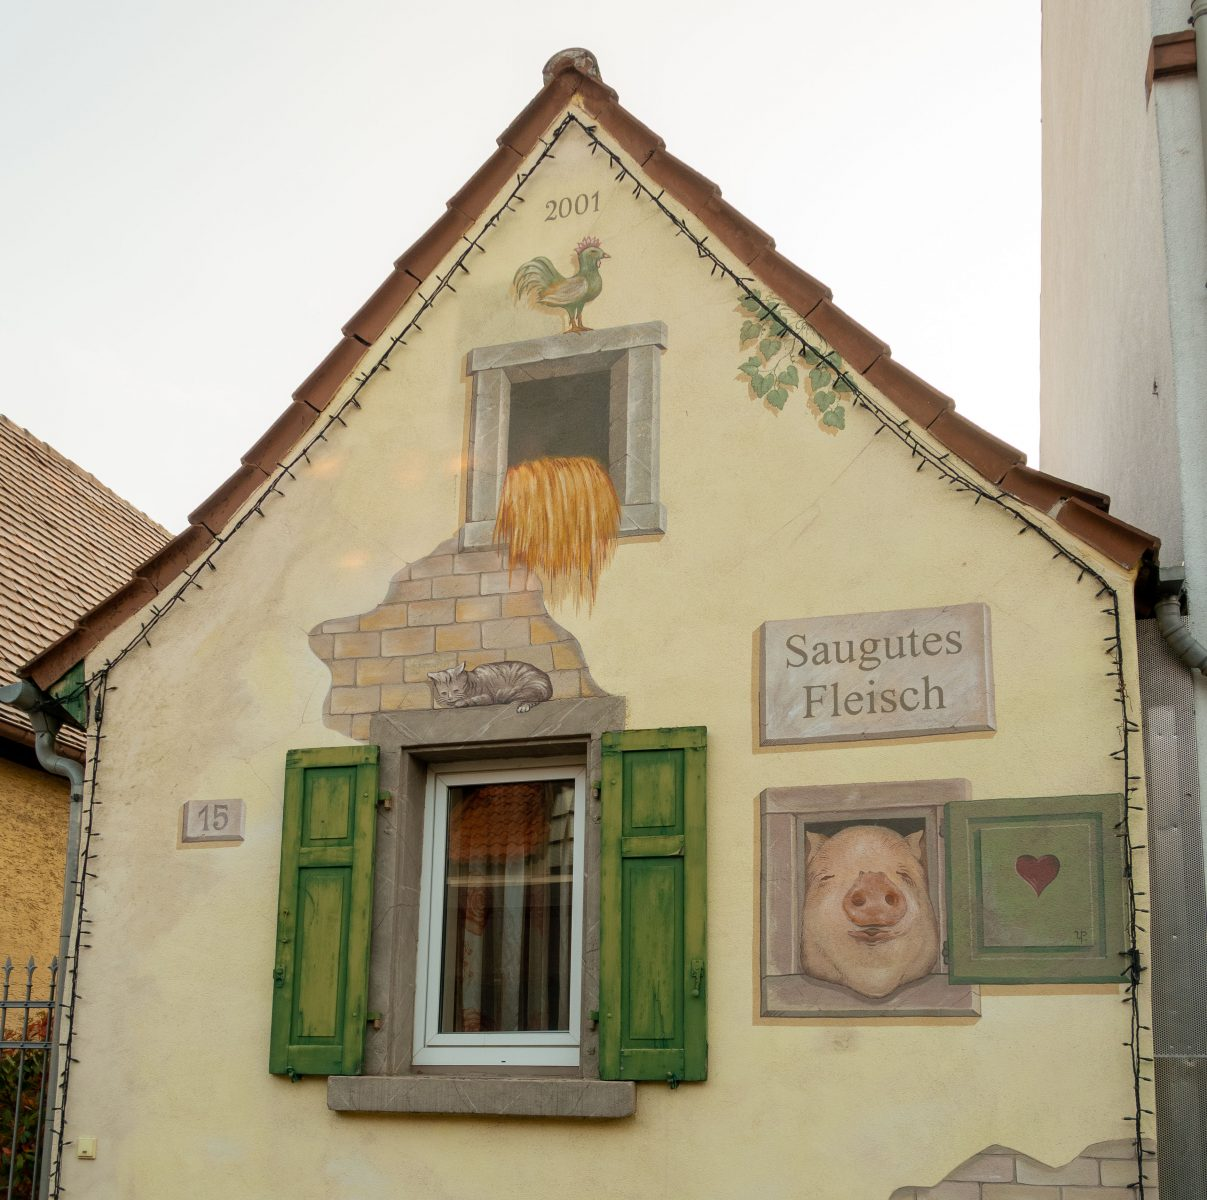 Fassade in Weisenheim am Berg, Pfalz